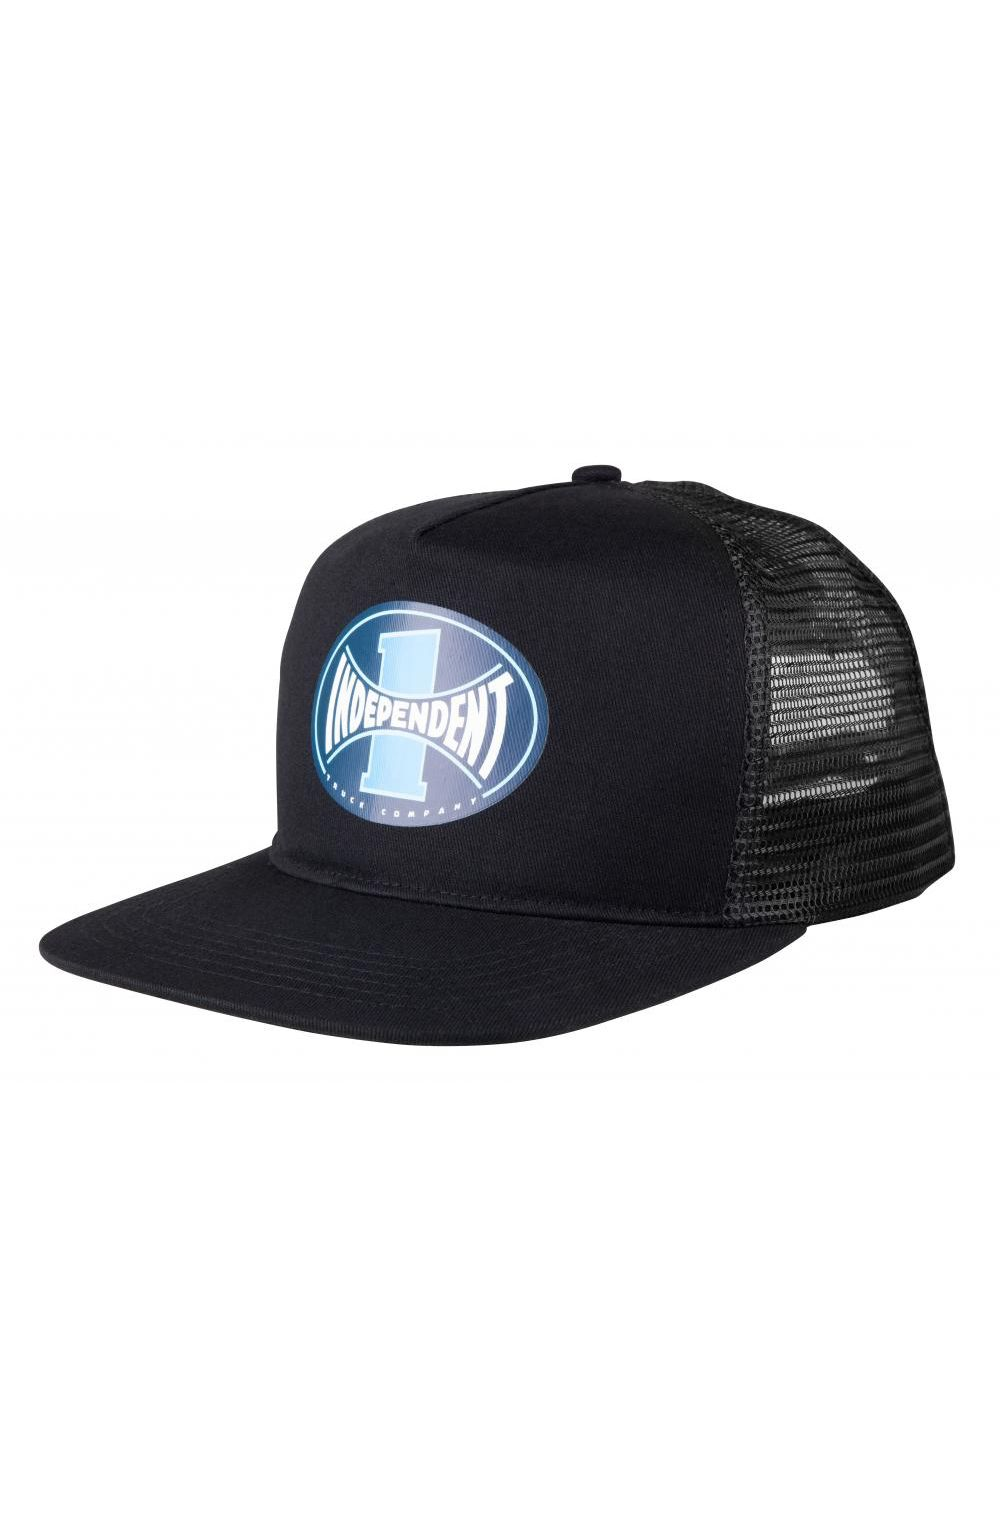 Independent Cap   ITC SPAN MESHBACK CAP Black/Black